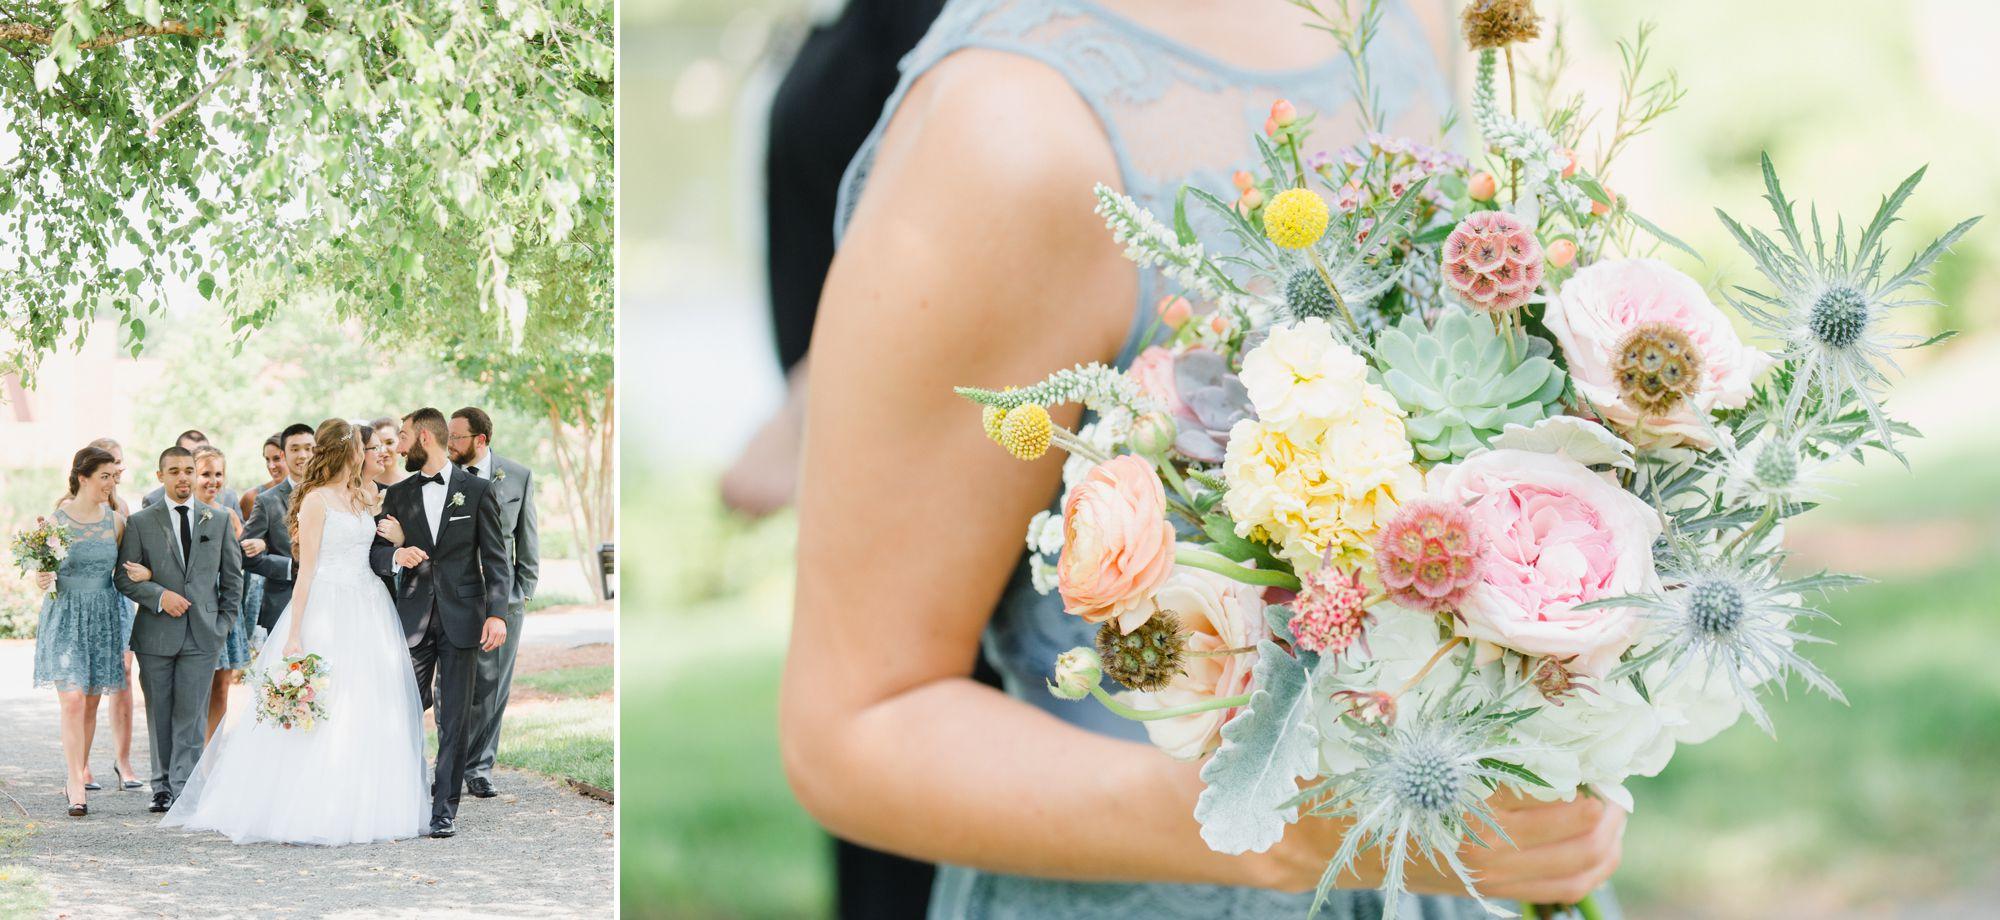 uptown-charlotte-orthodox-greek-wedding 43